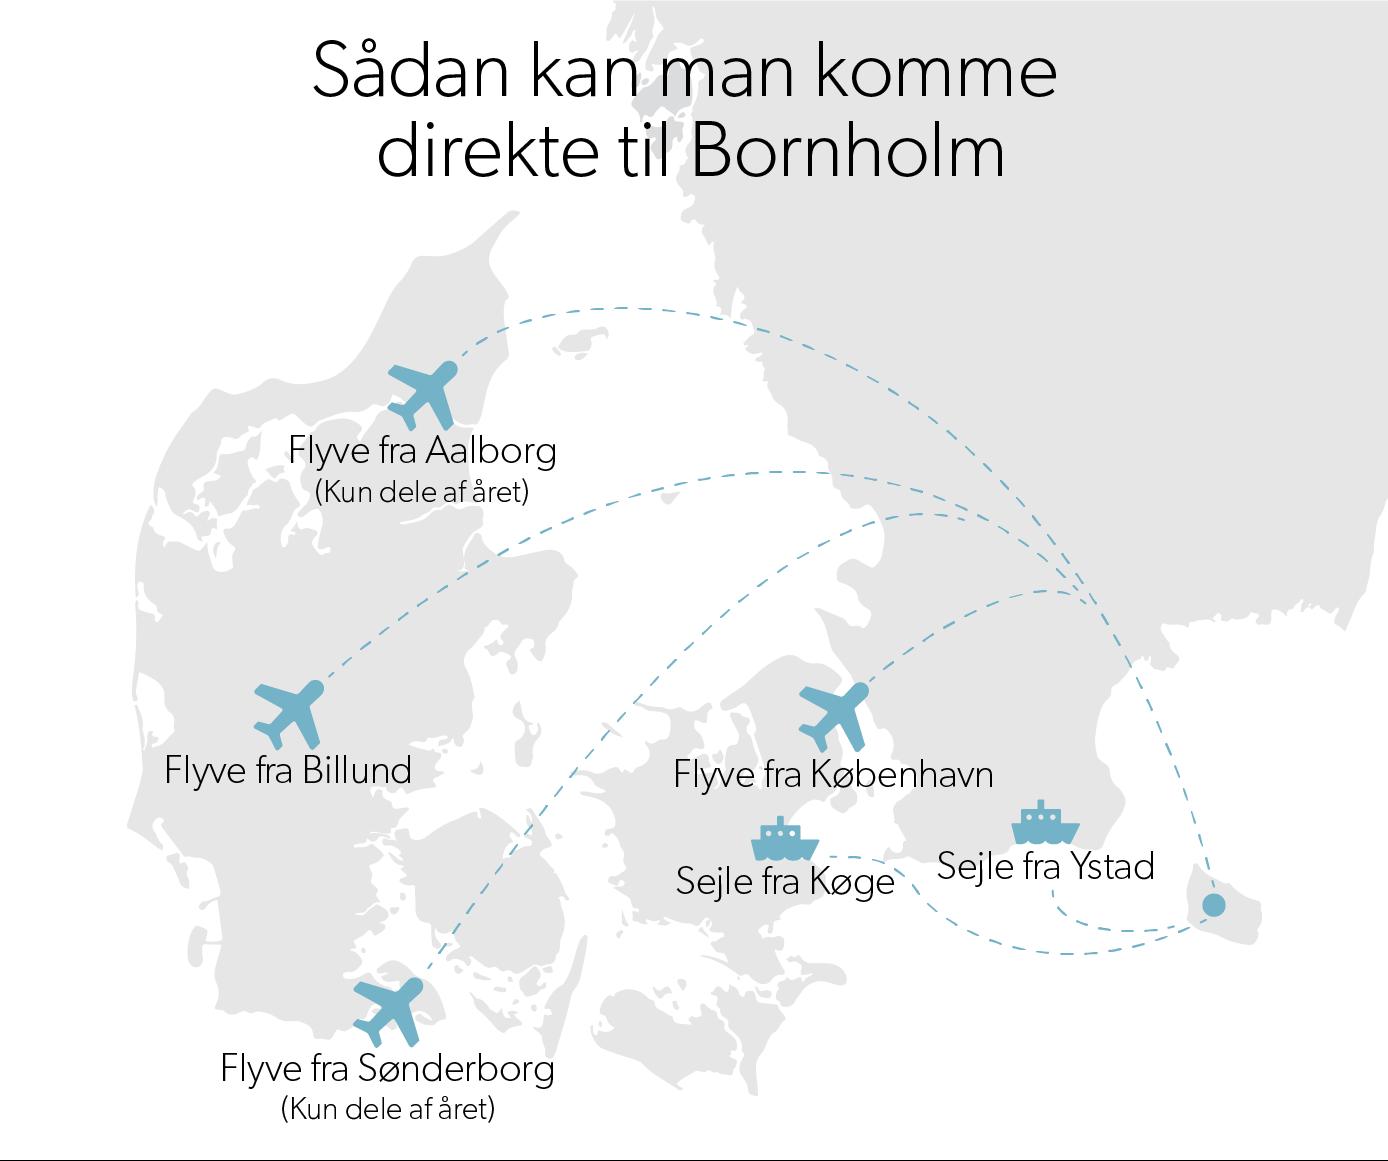 bornholm_694_2.png